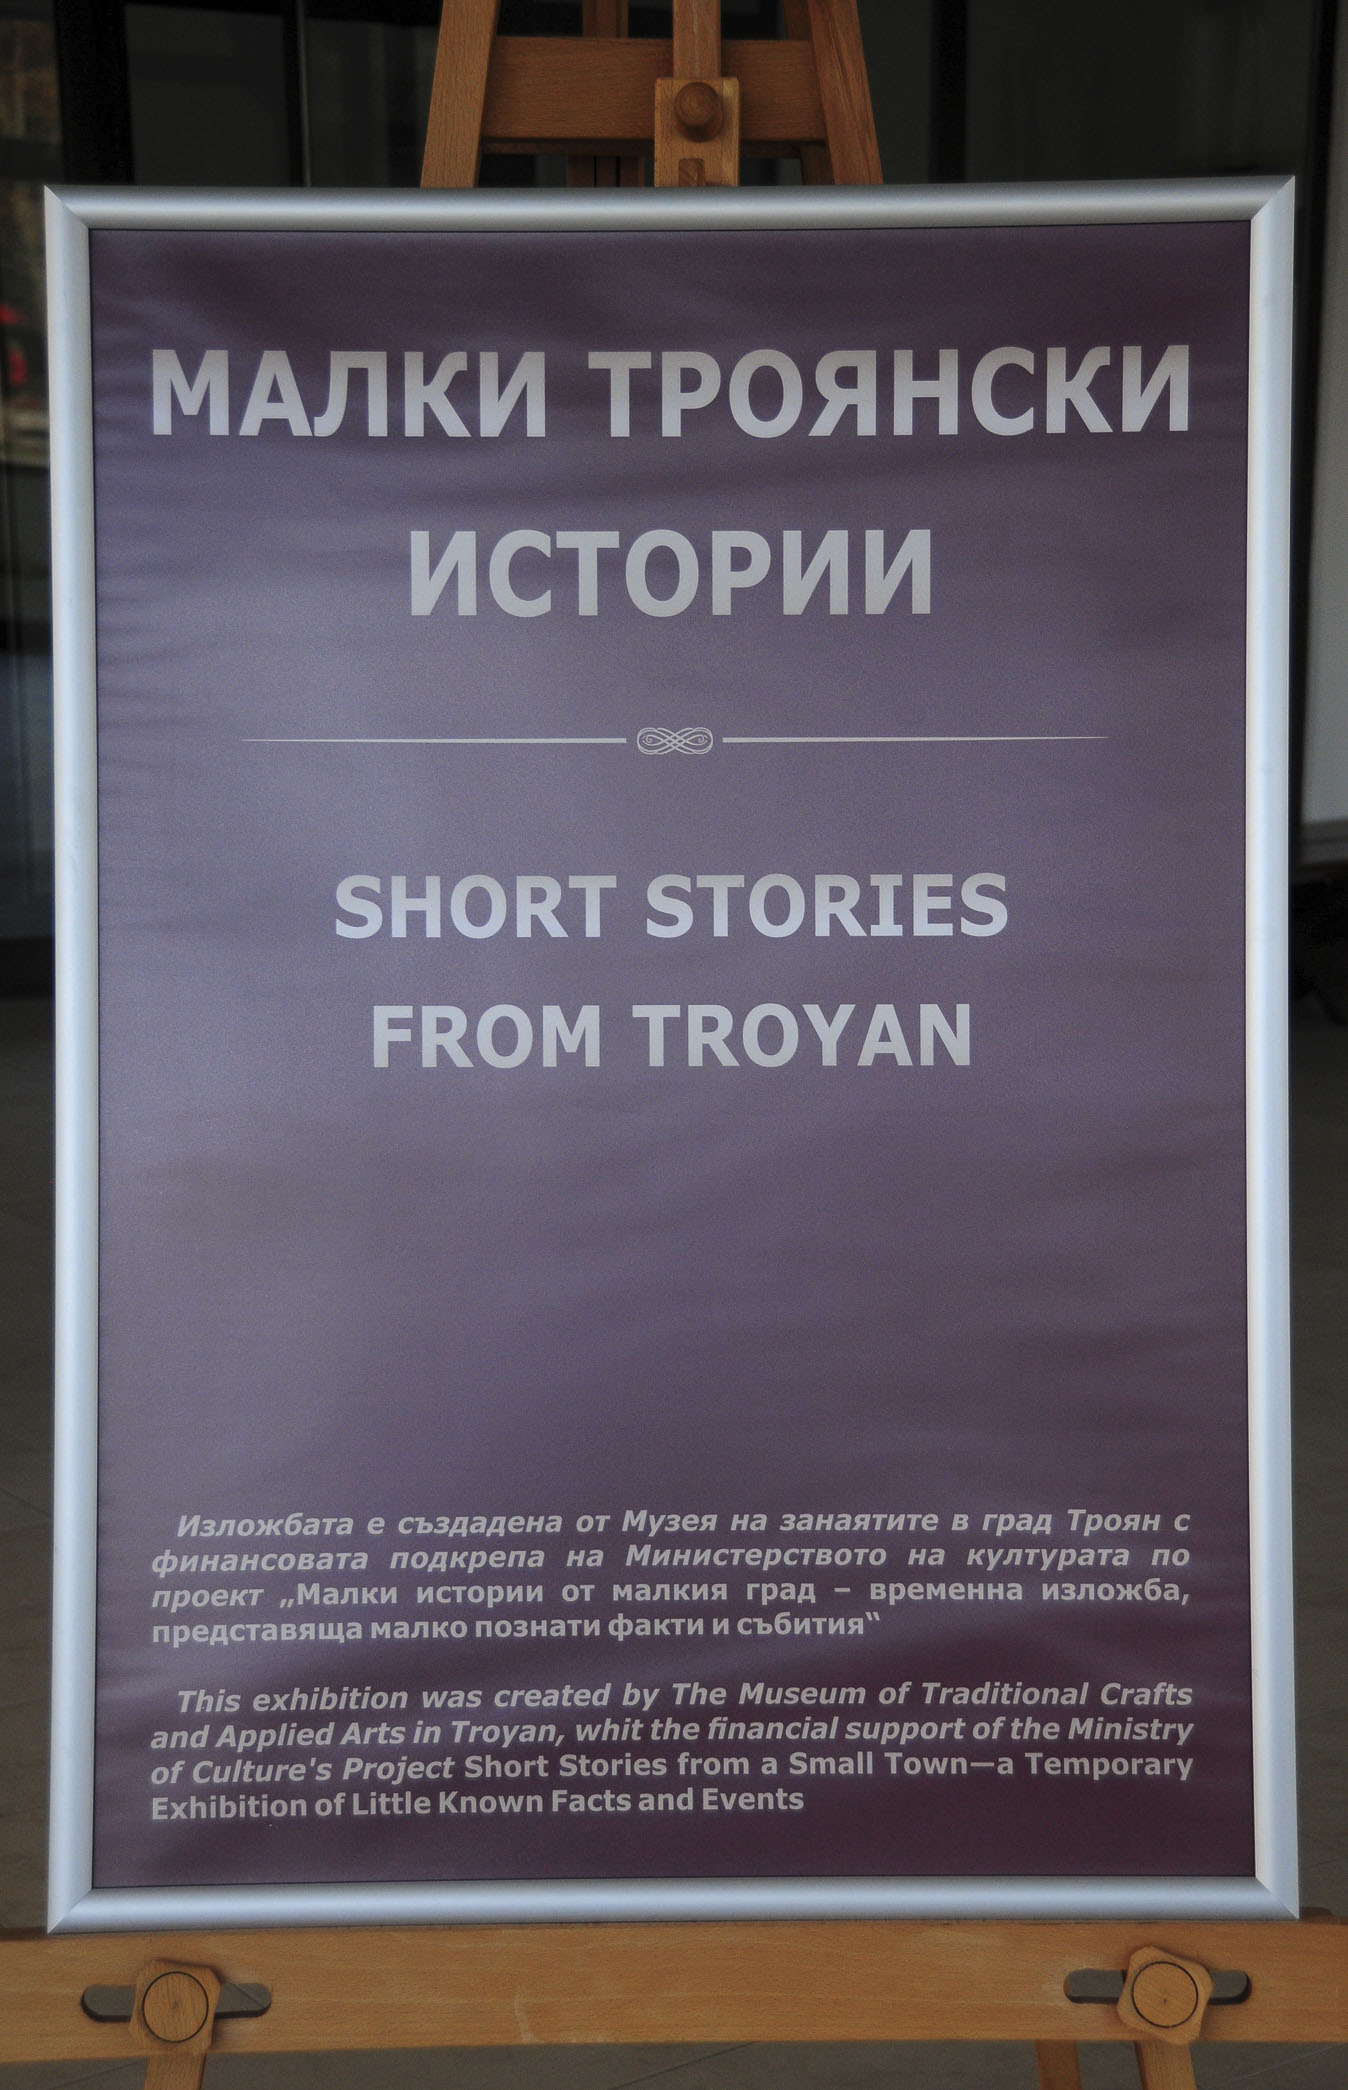 troyan-museum-malki-istorii-1